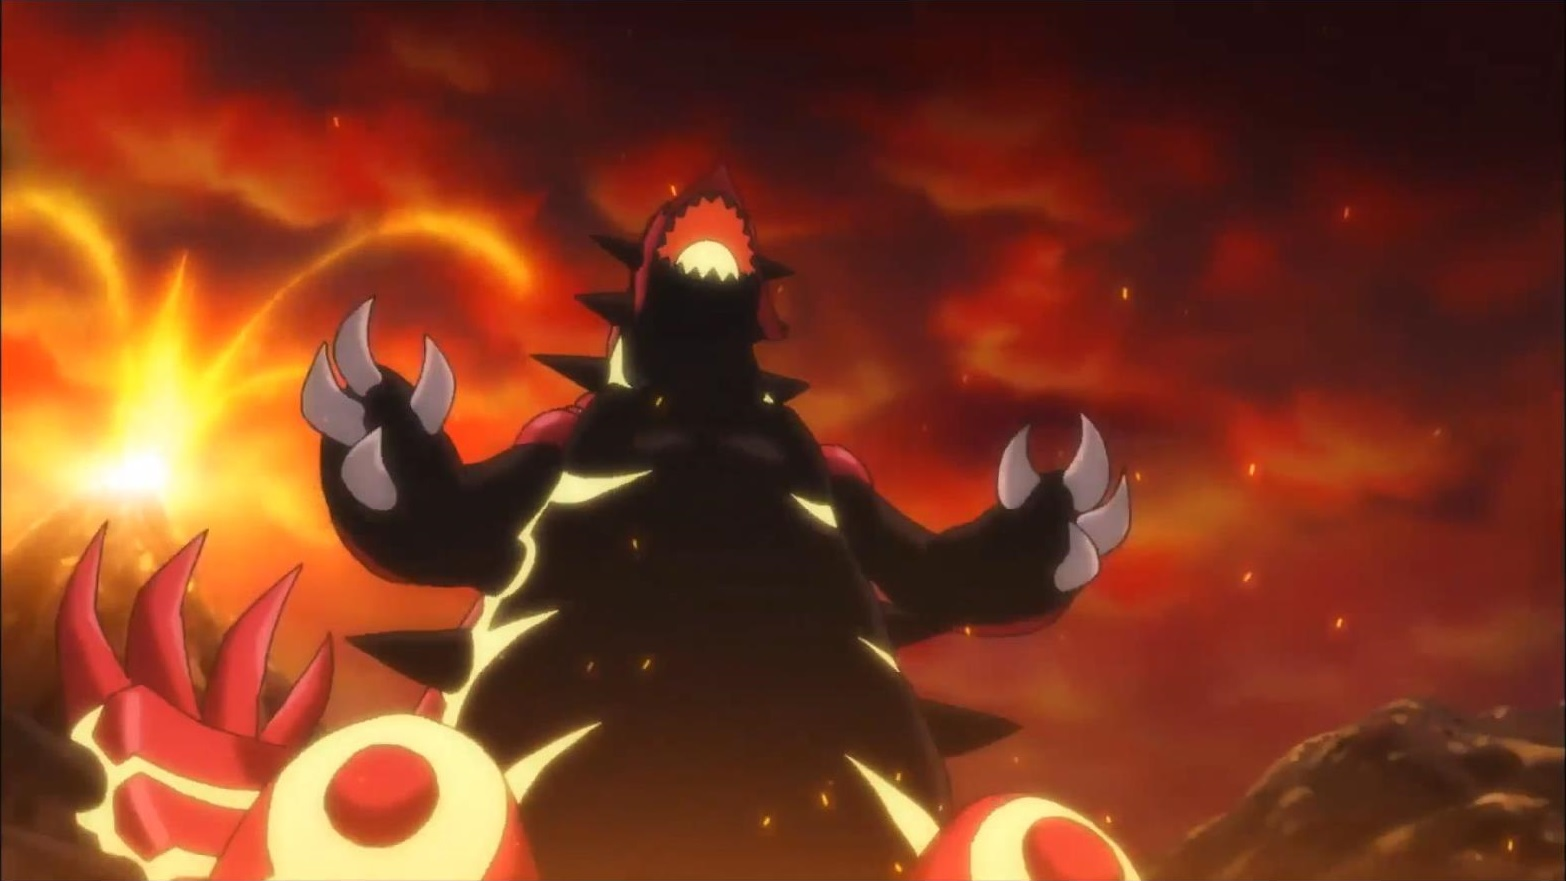 Primal Kyogre Gif Image  Primal Groudon Trailer Anime  Pokémon Wiki  Fandom